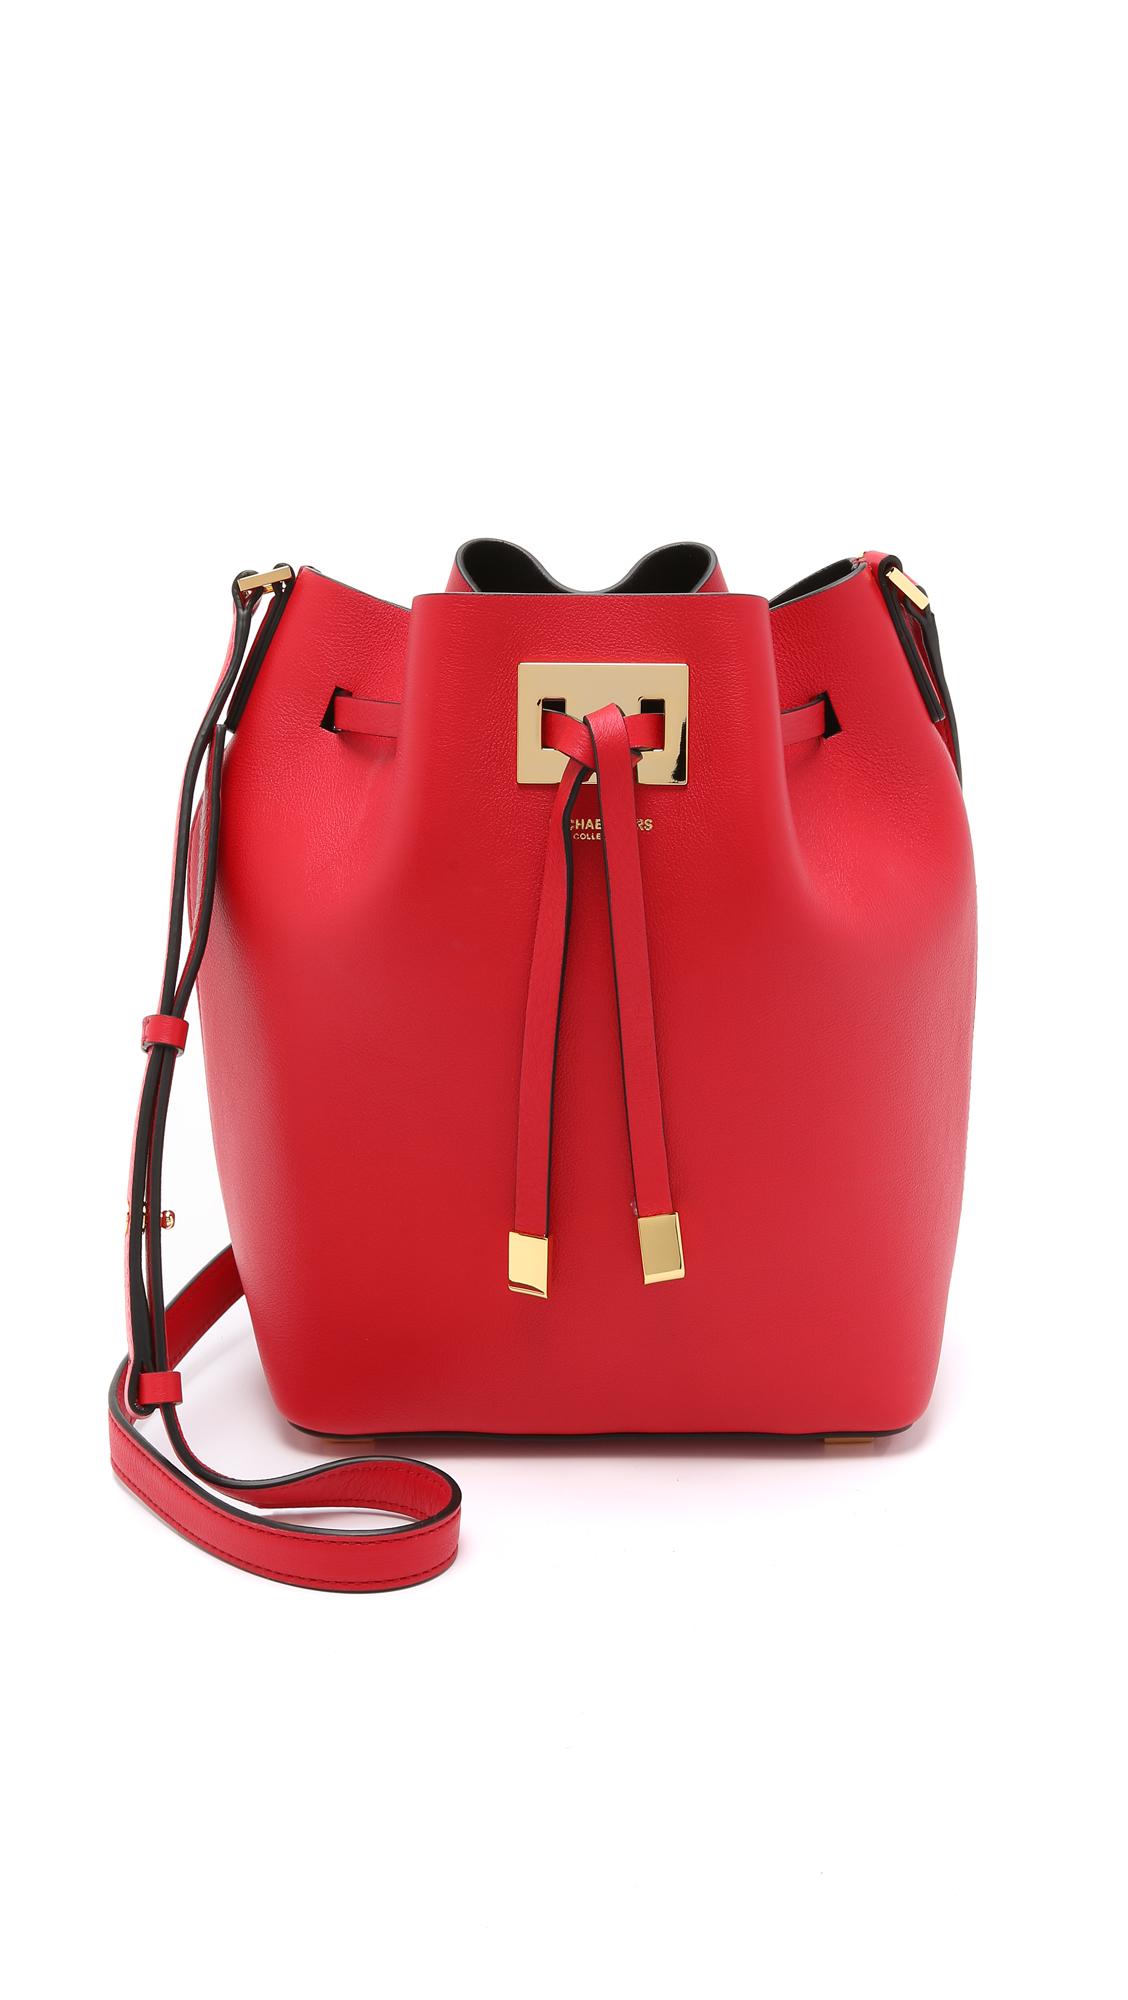 724f304a9ce2 Michael Kors Miranda Medium Drawstring Bag - Crimson in Red - Lyst